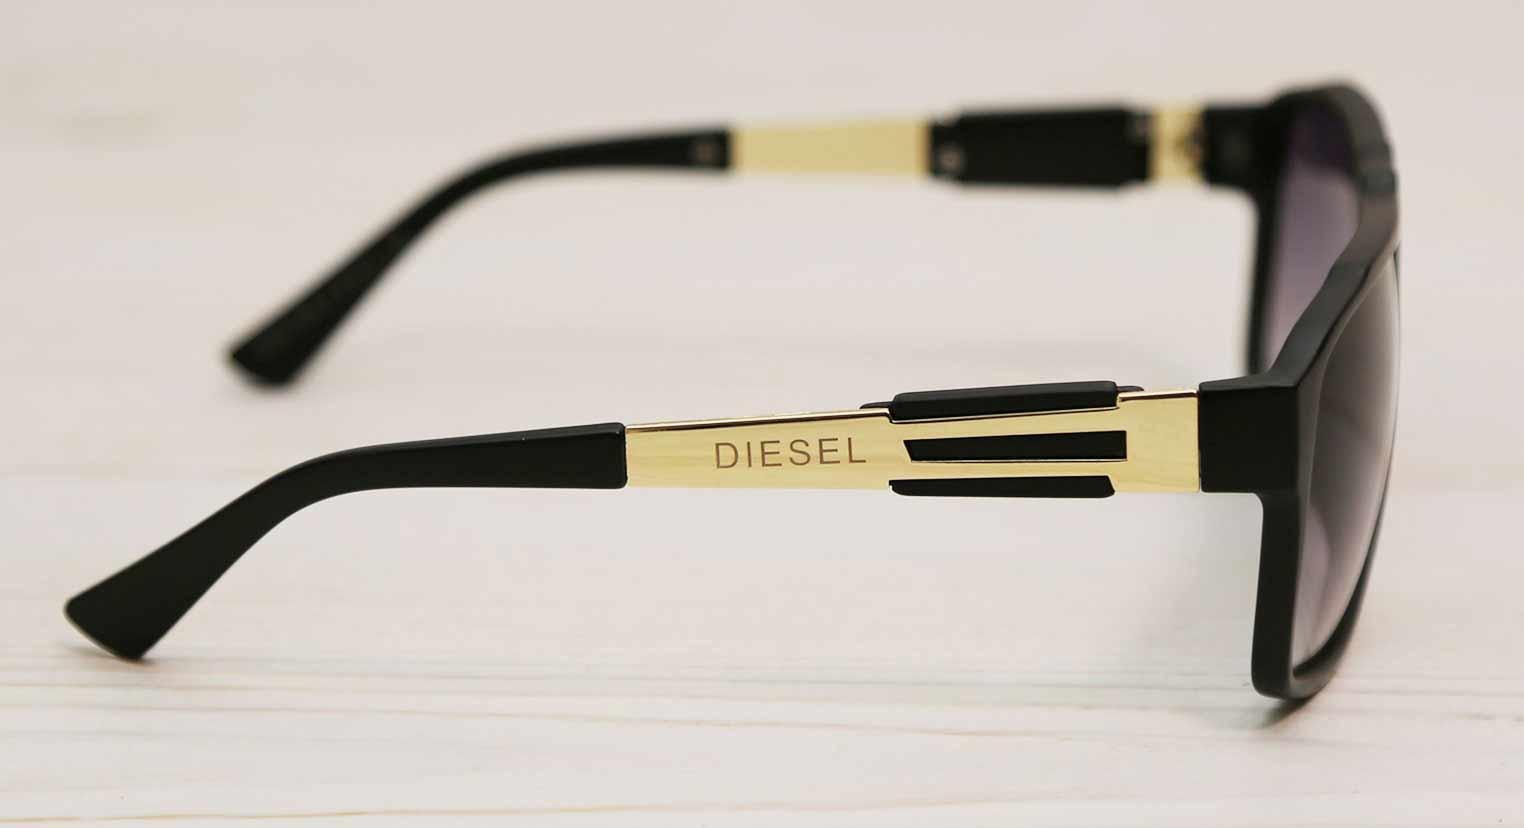 عینک آفتابی دیزل مدل تری لاین Diesel 3Line